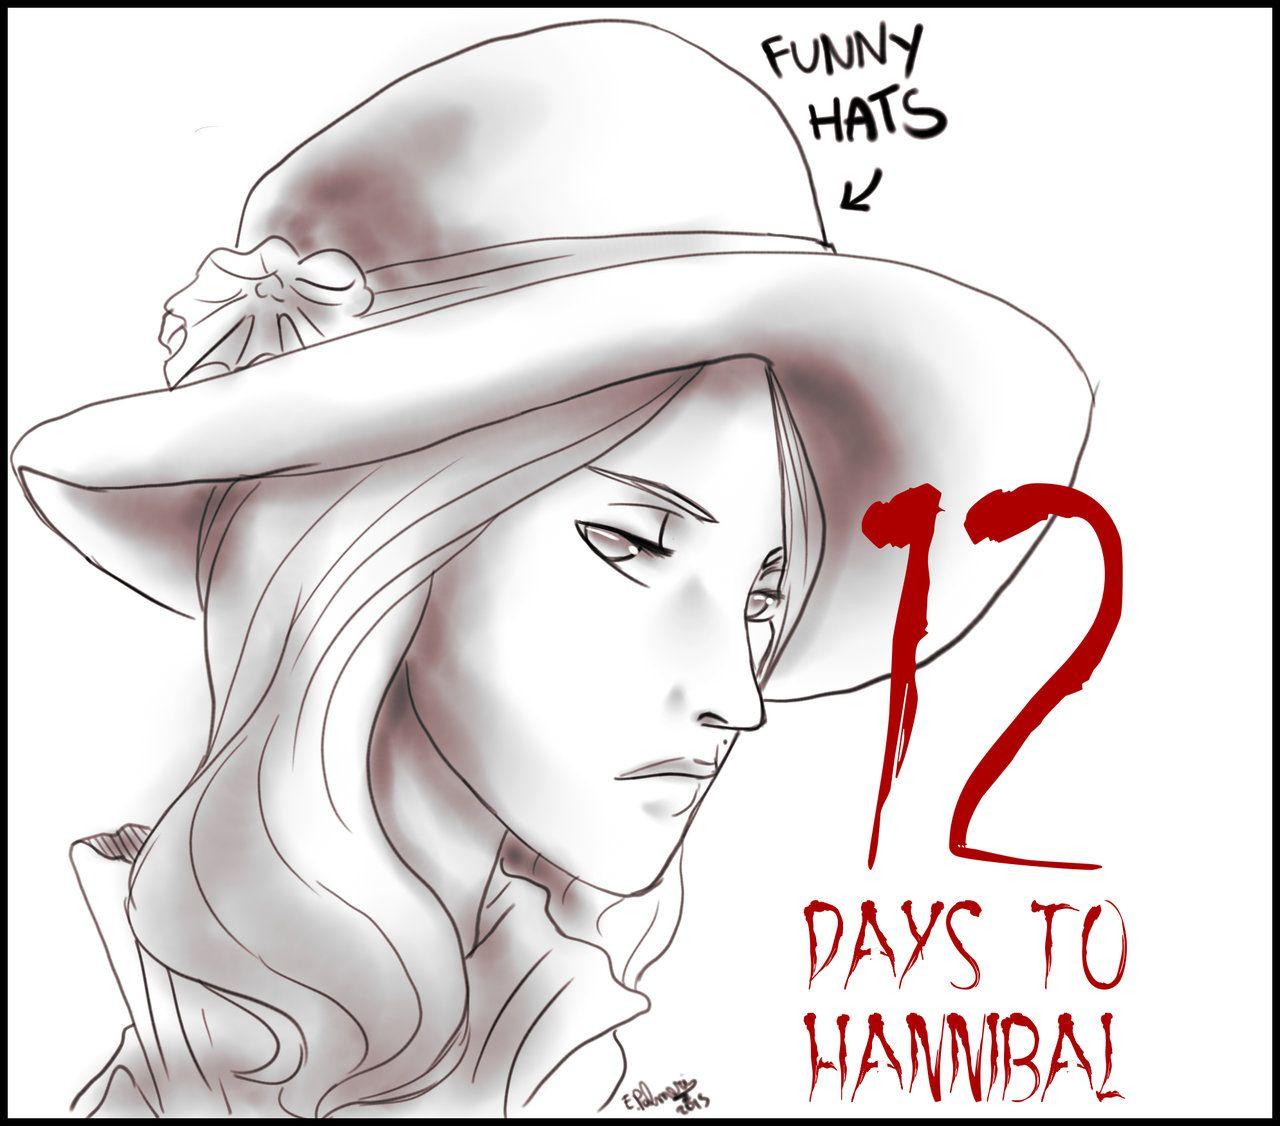 Another Hannibal Artblog: Hannibal countdown for the 3rd season - 12